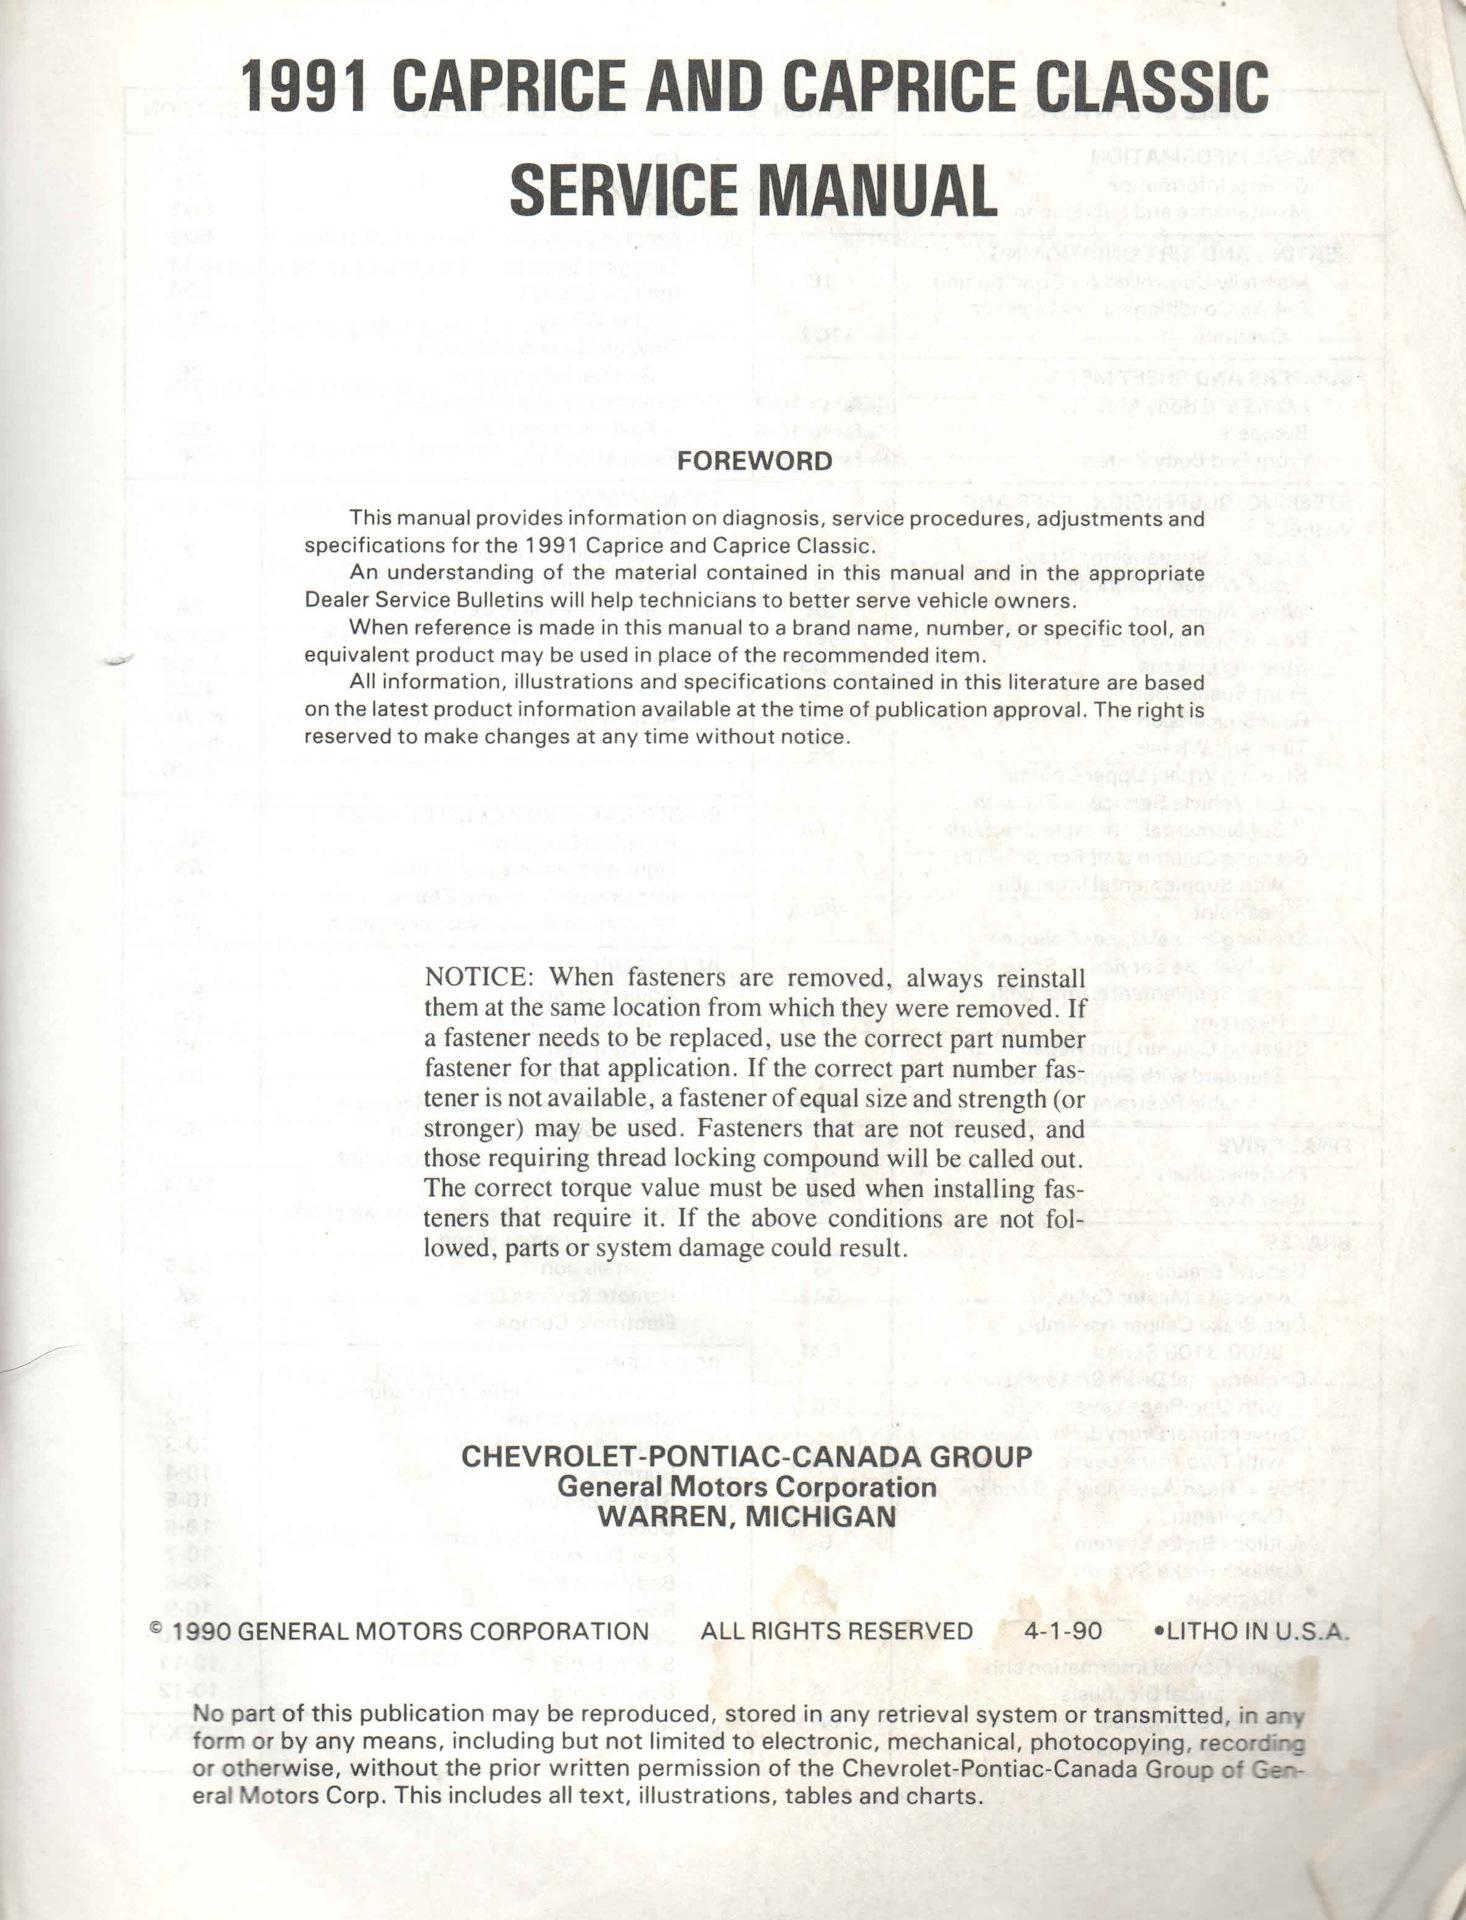 service manual  1991 chevrolet caprice service manual free